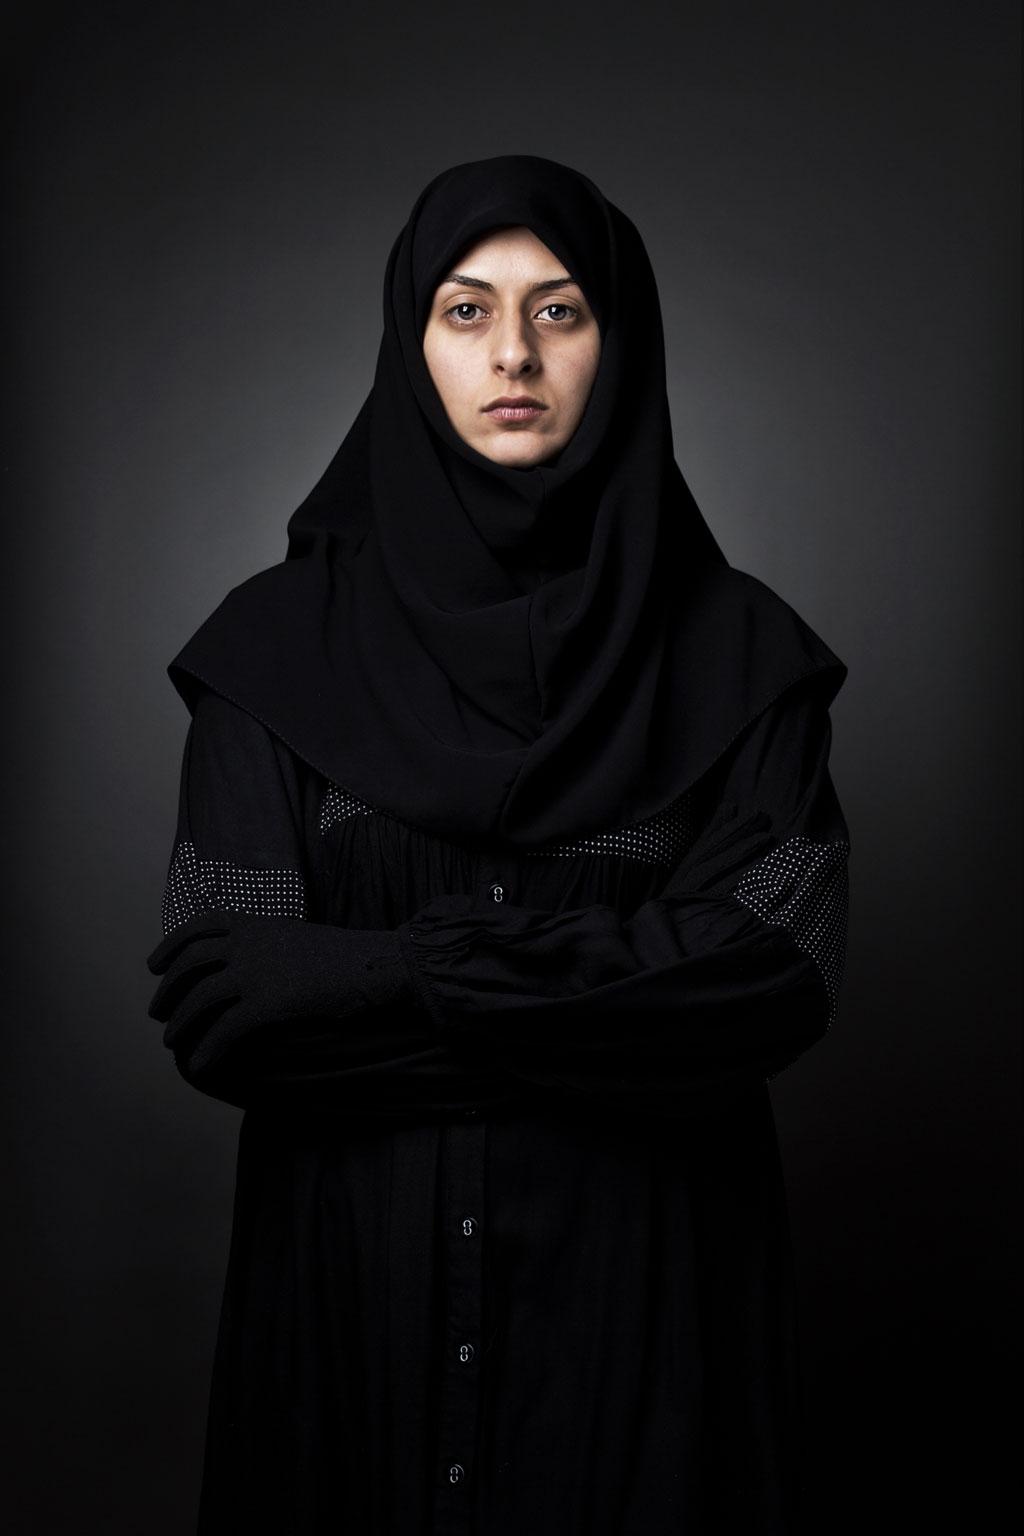 Samaneh Khosravi - Verhüllung - Felix Schoeller Photoaward